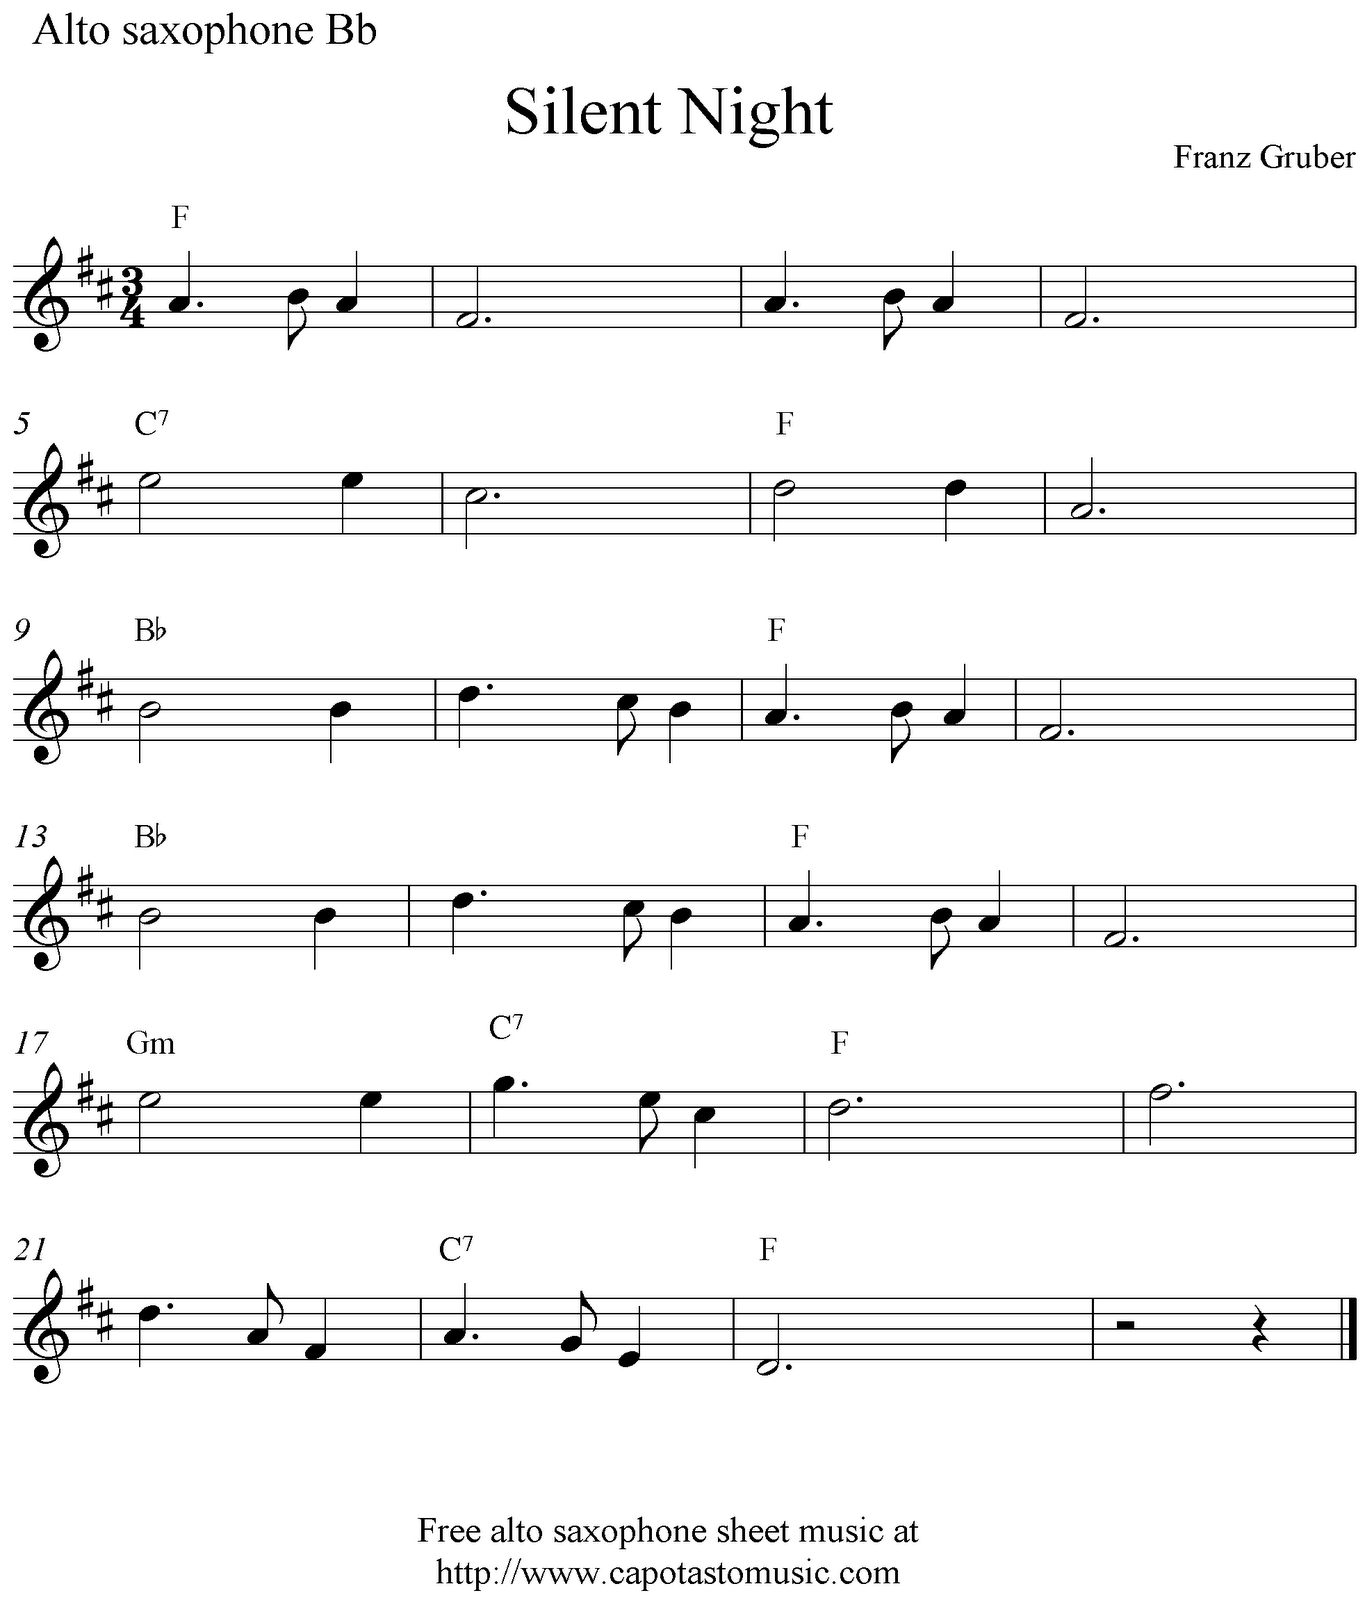 Free Sheet Music Scores: Silent Night, Free Christmas Alto Saxophone - Free Printable Christmas Sheet Music For Alto Saxophone